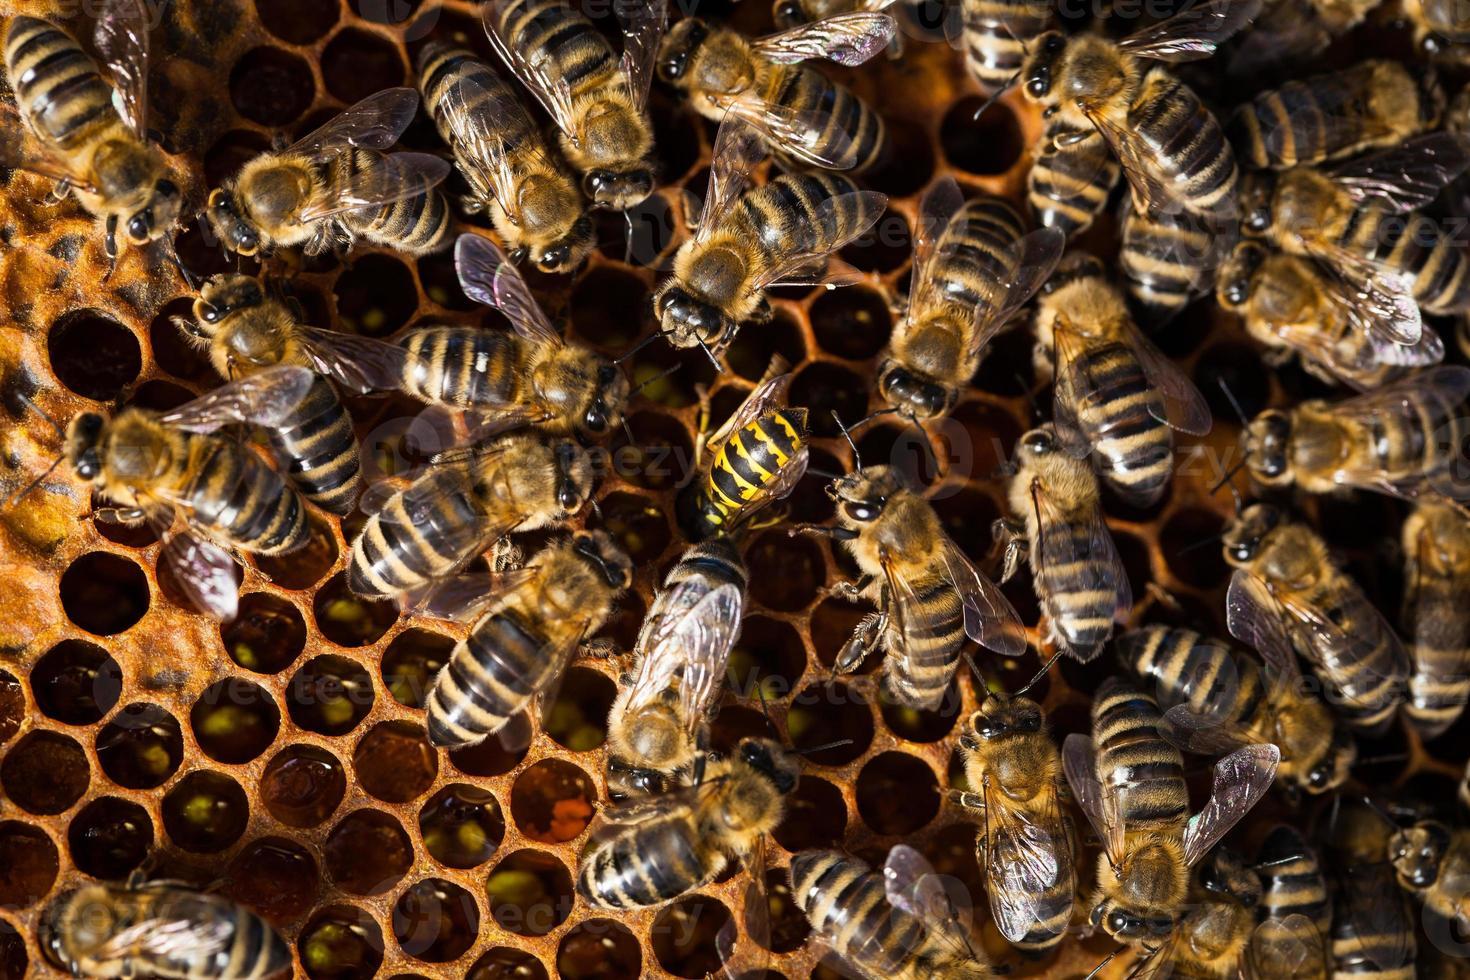 Macro shot of bees swarming on a honeycomb photo